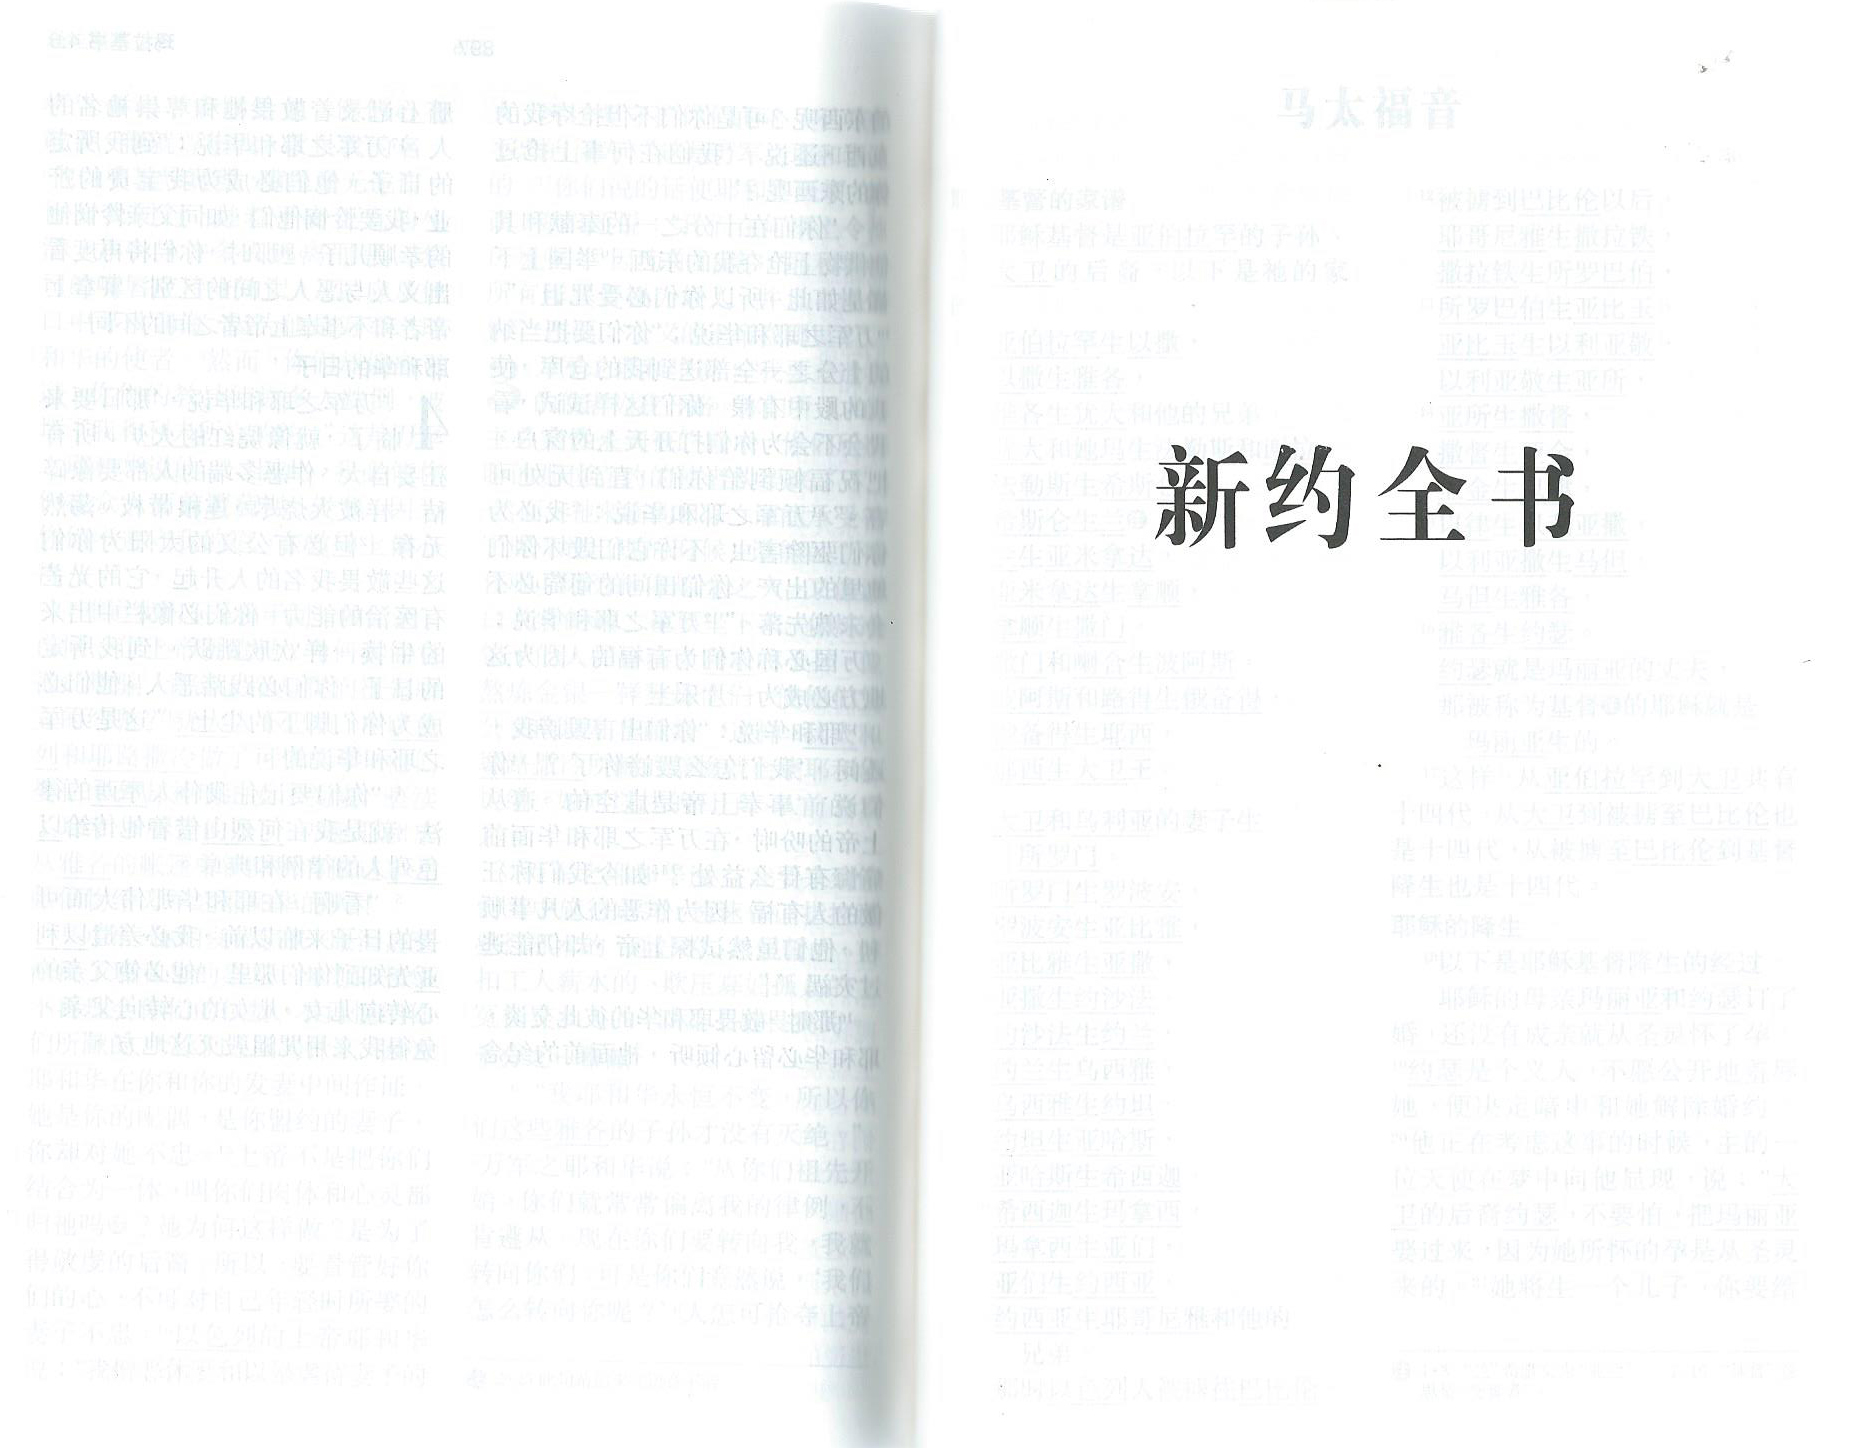 Chinesische_Bibel_5